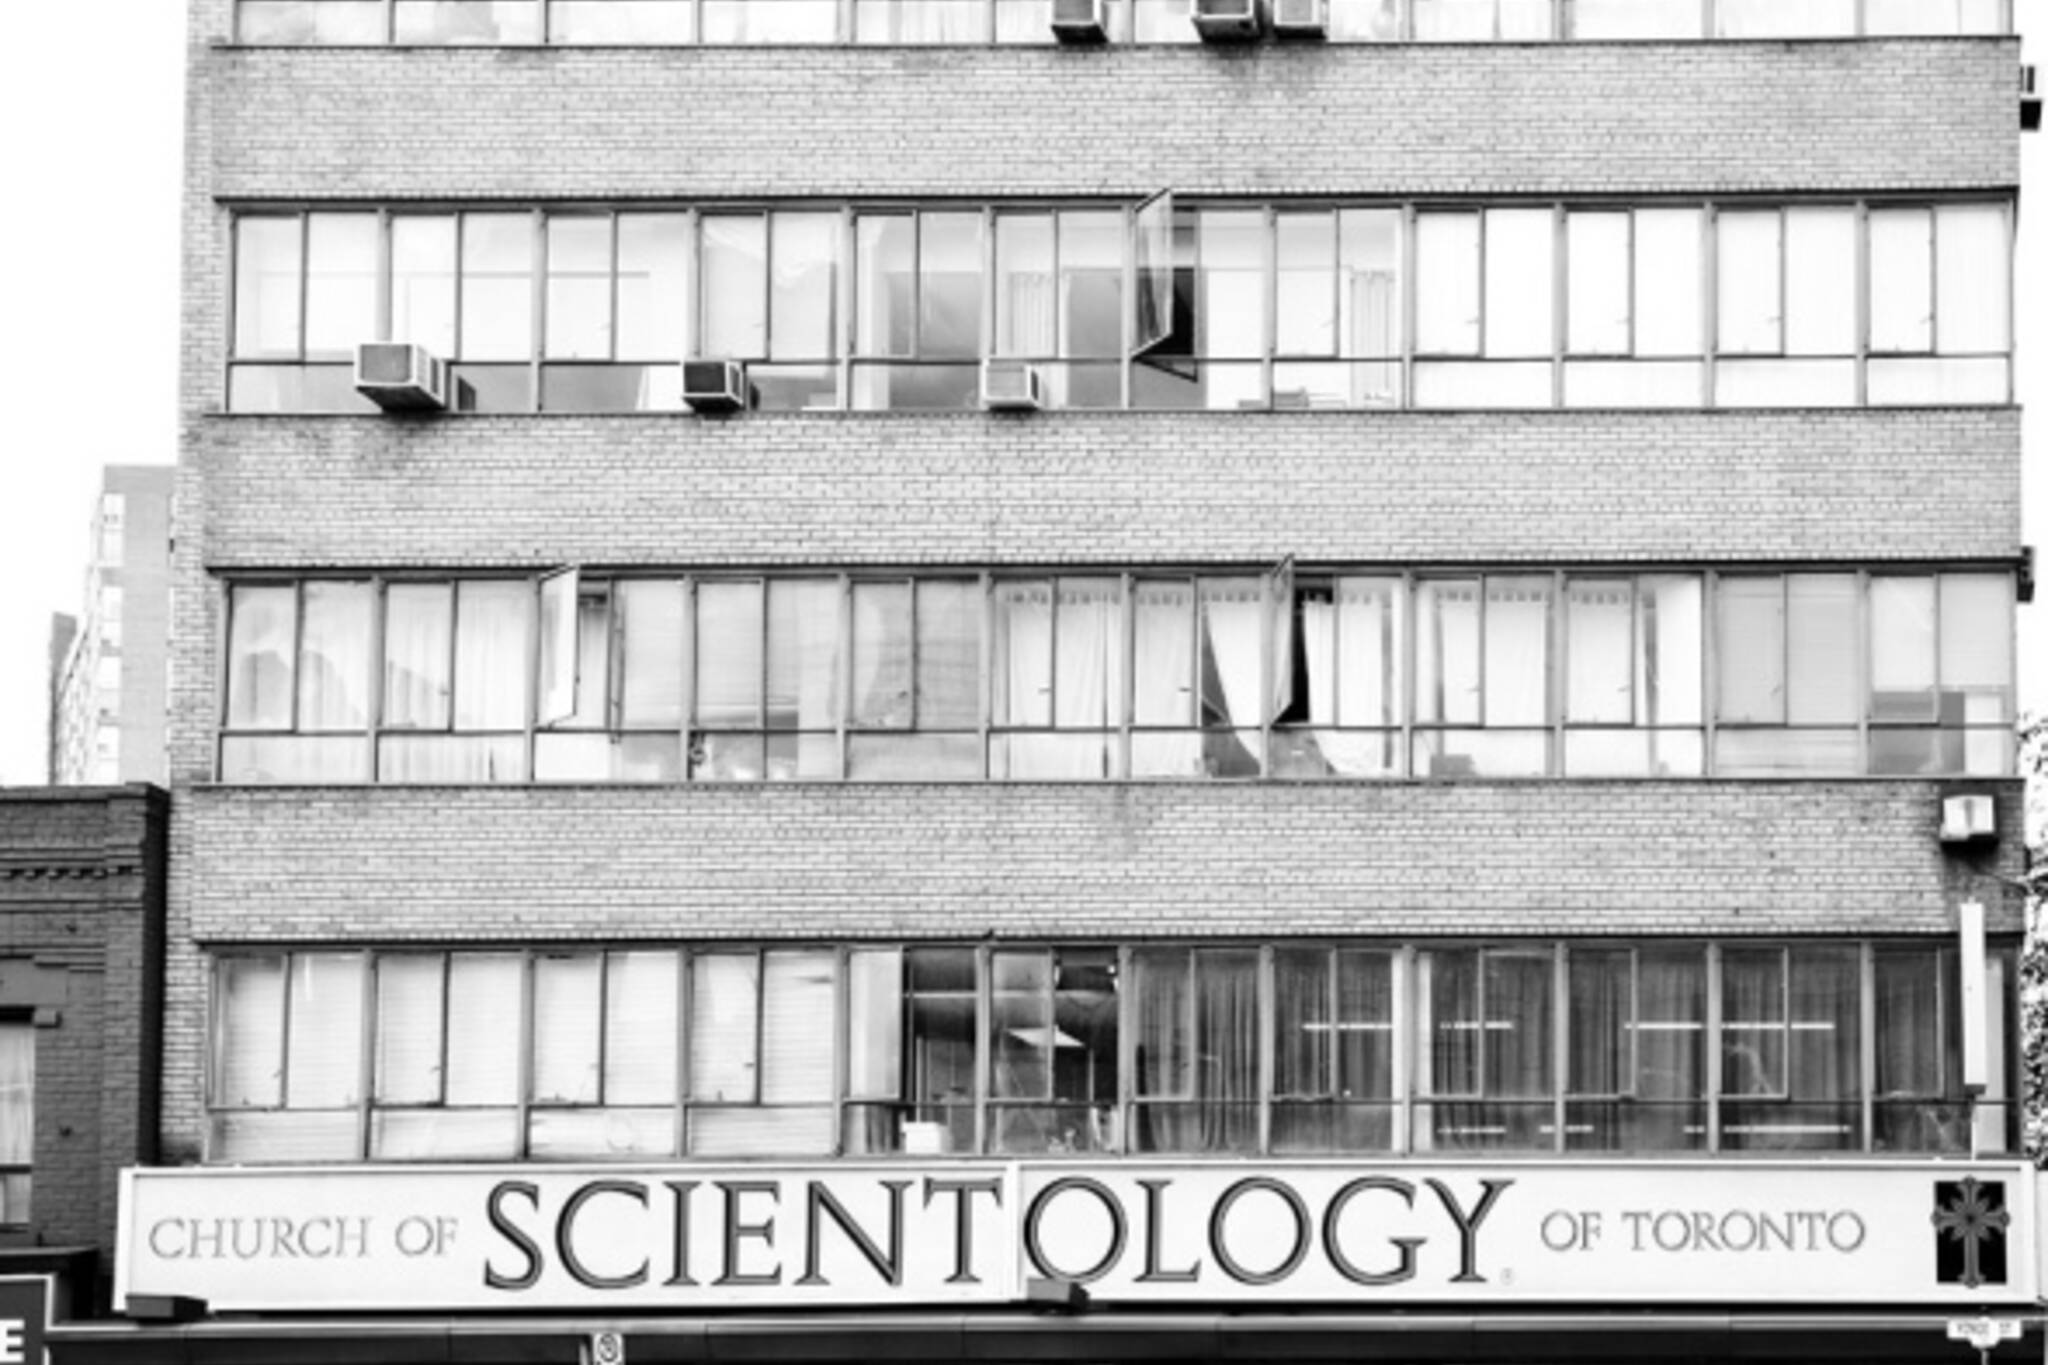 Scientology Toronto